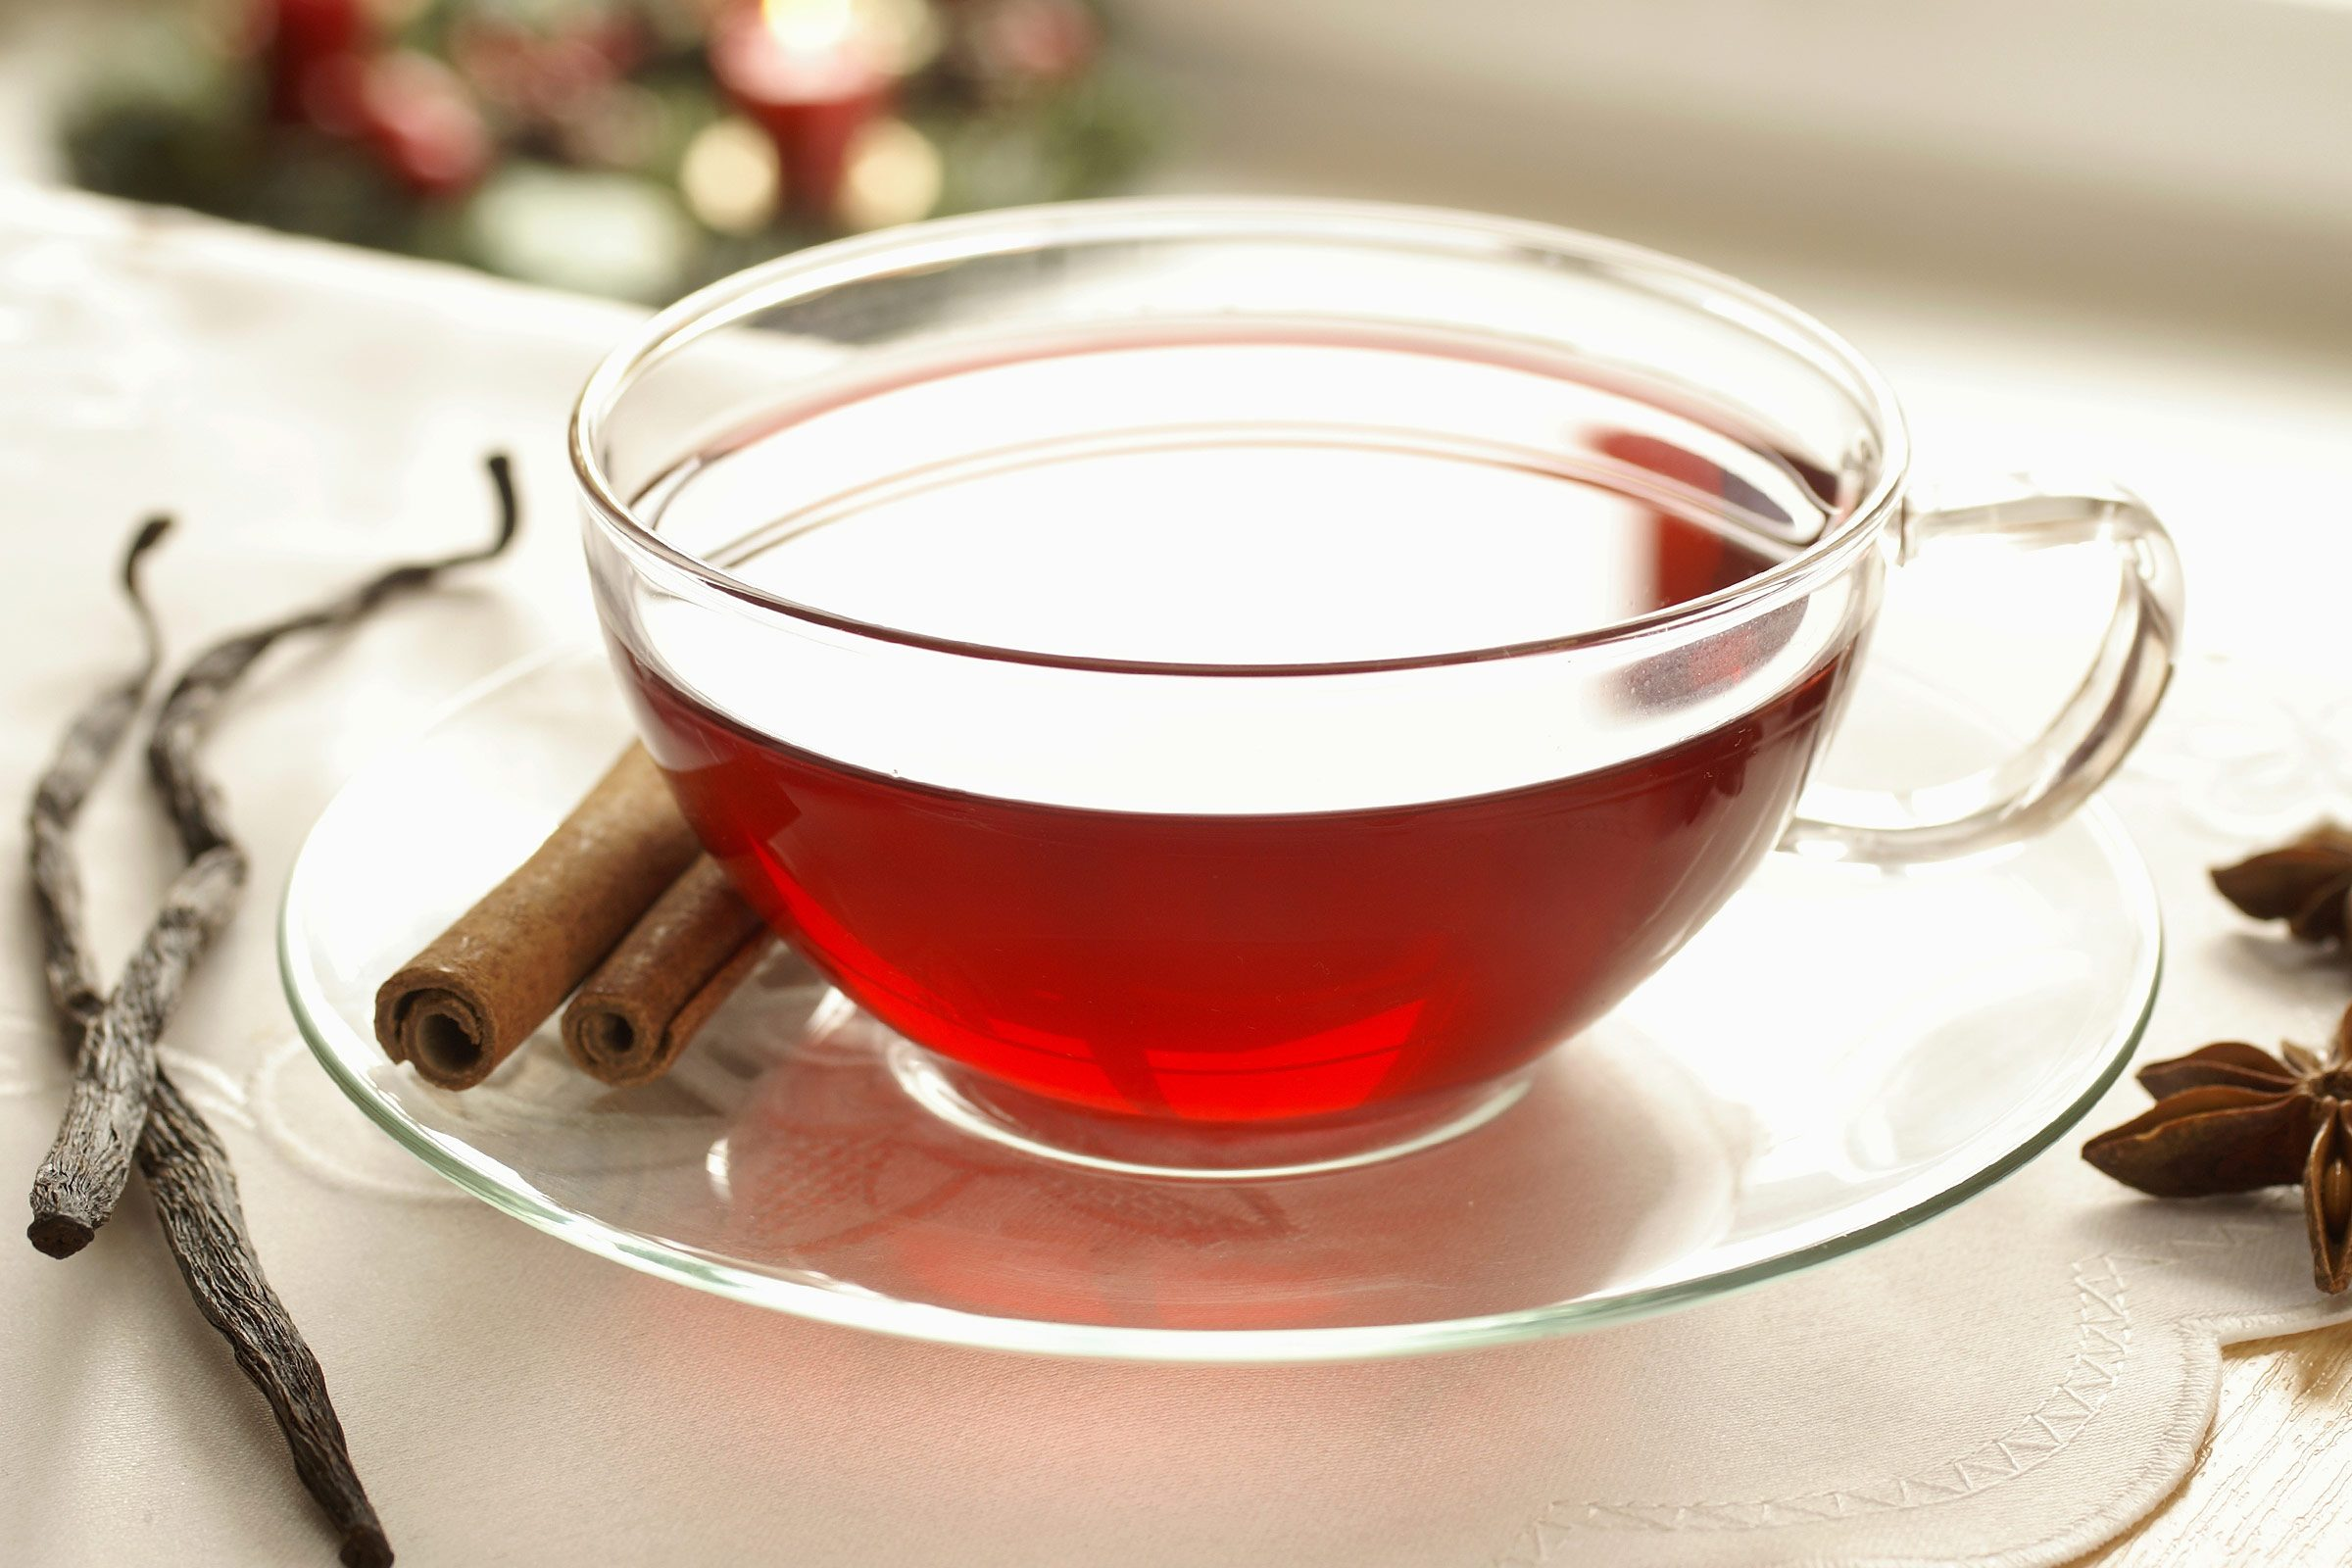 Sore throat remedy: Clove tea